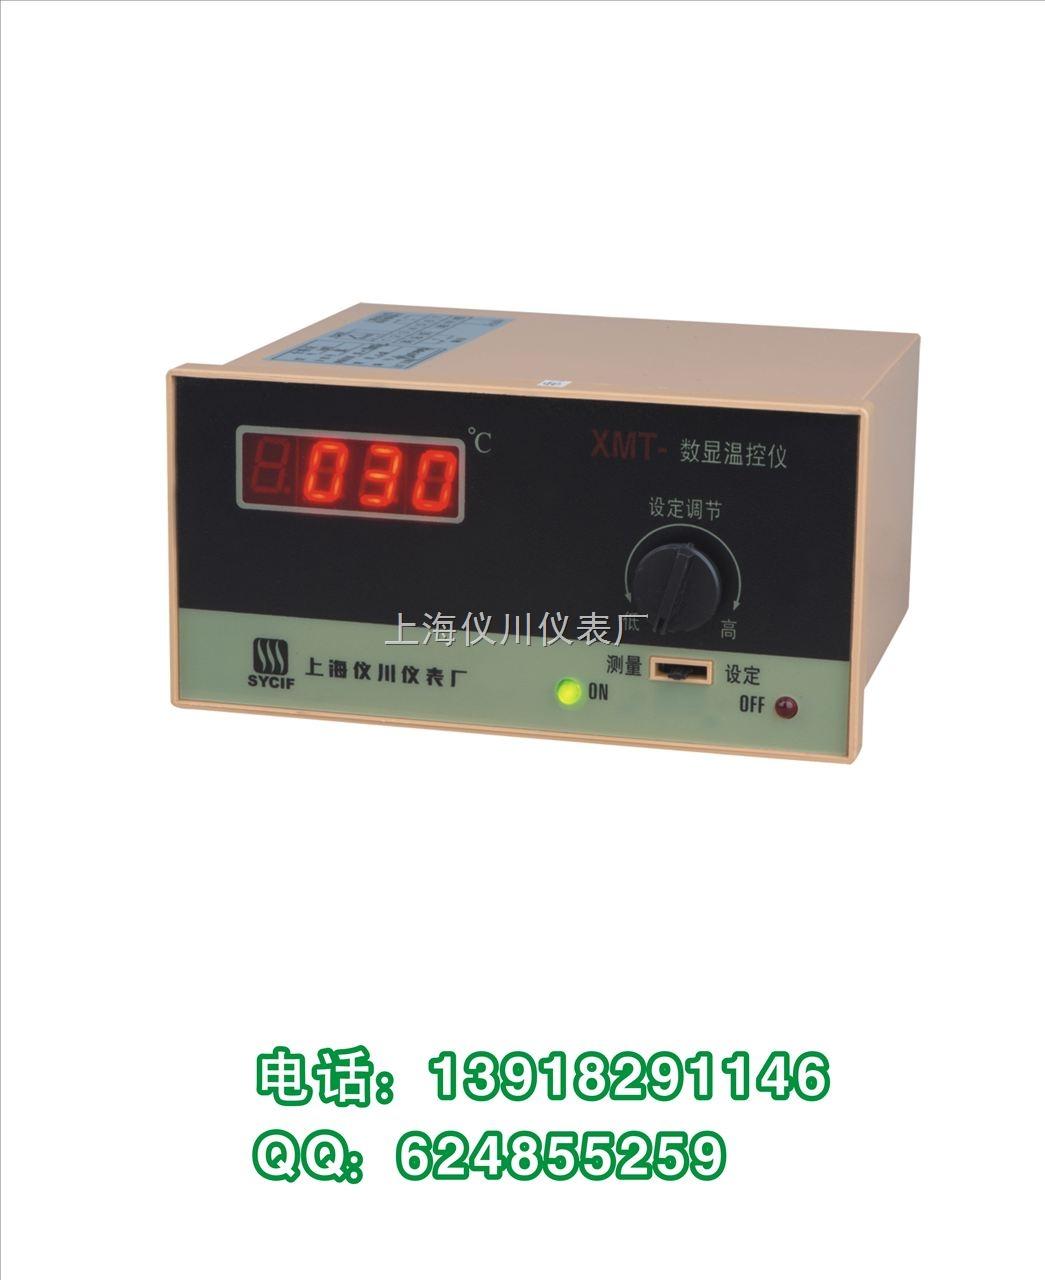 xmt-102-温度控制仪-上海仪川仪表厂